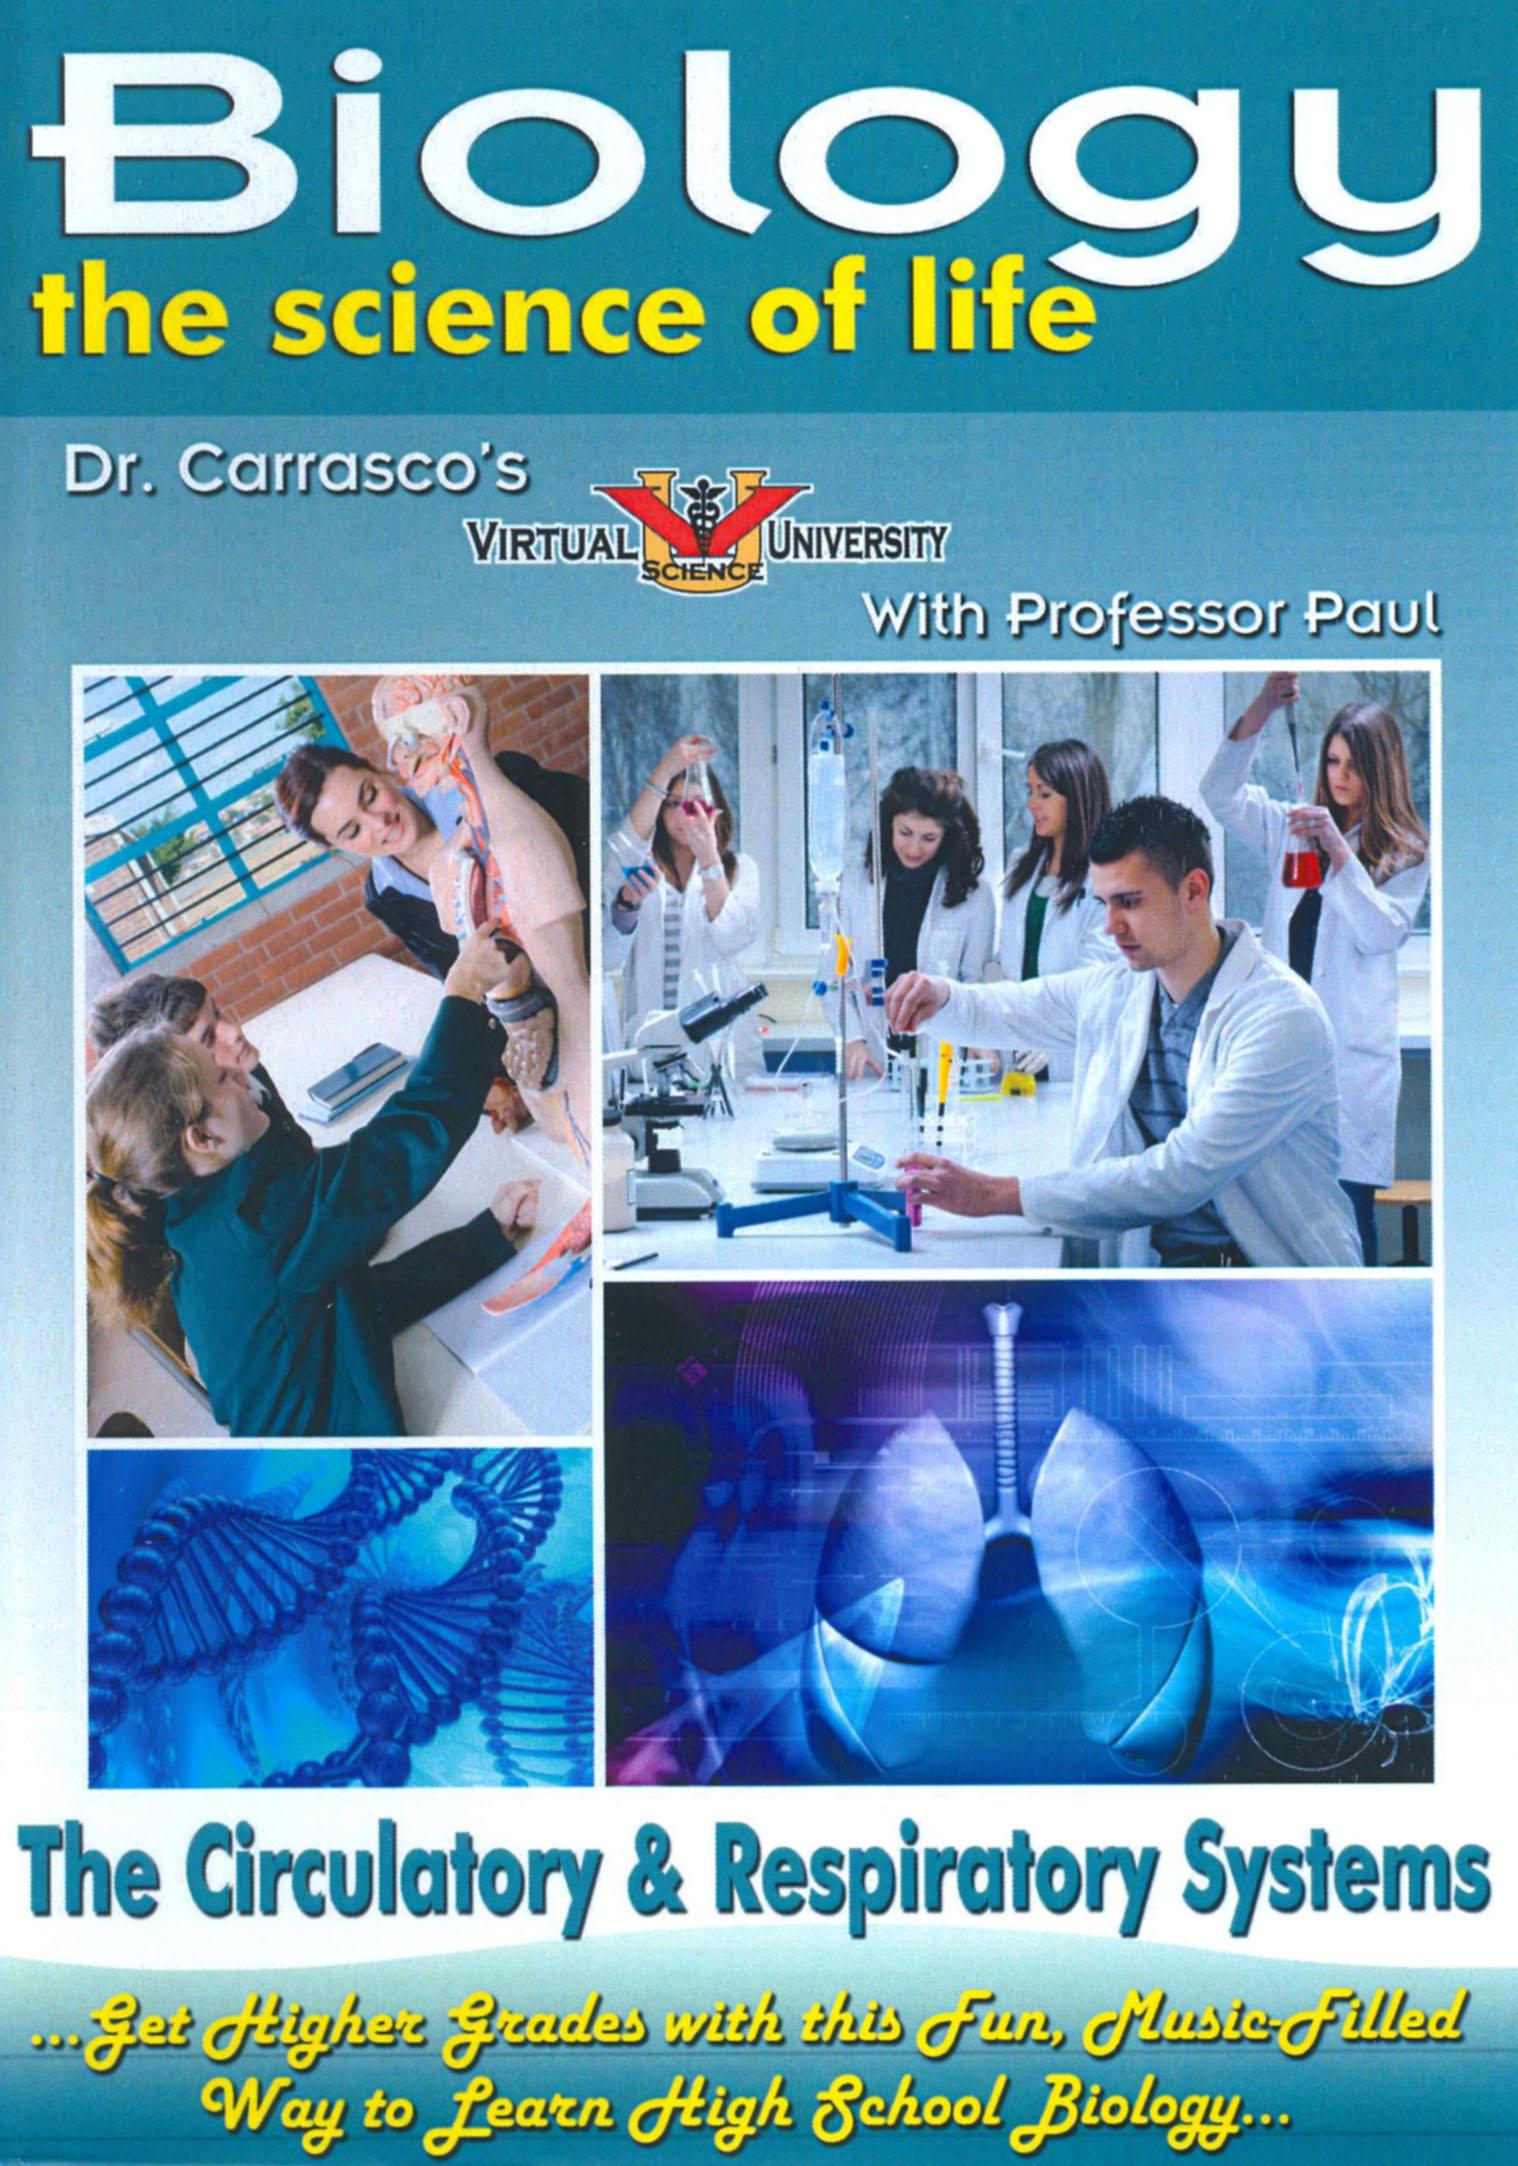 The Circulatory & Respiratory Systems